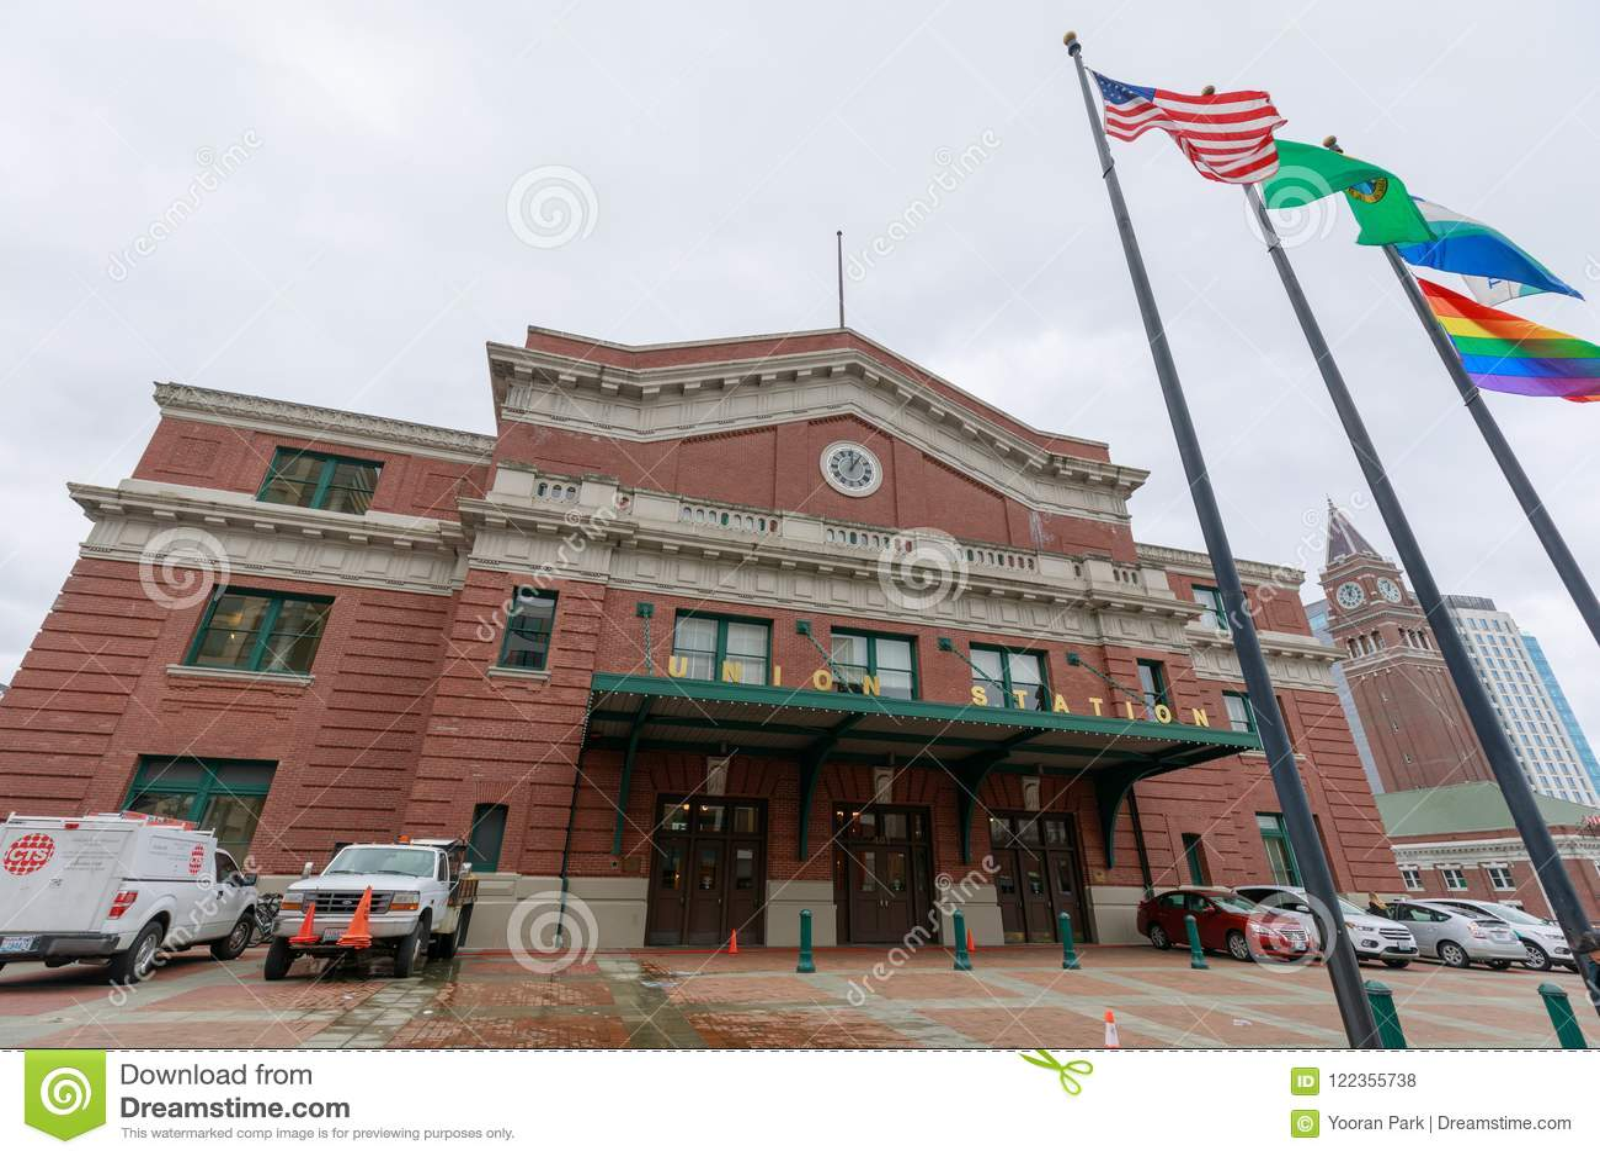 Unie Post, die een vroeger station in Seattle, Washington, de V.S. is